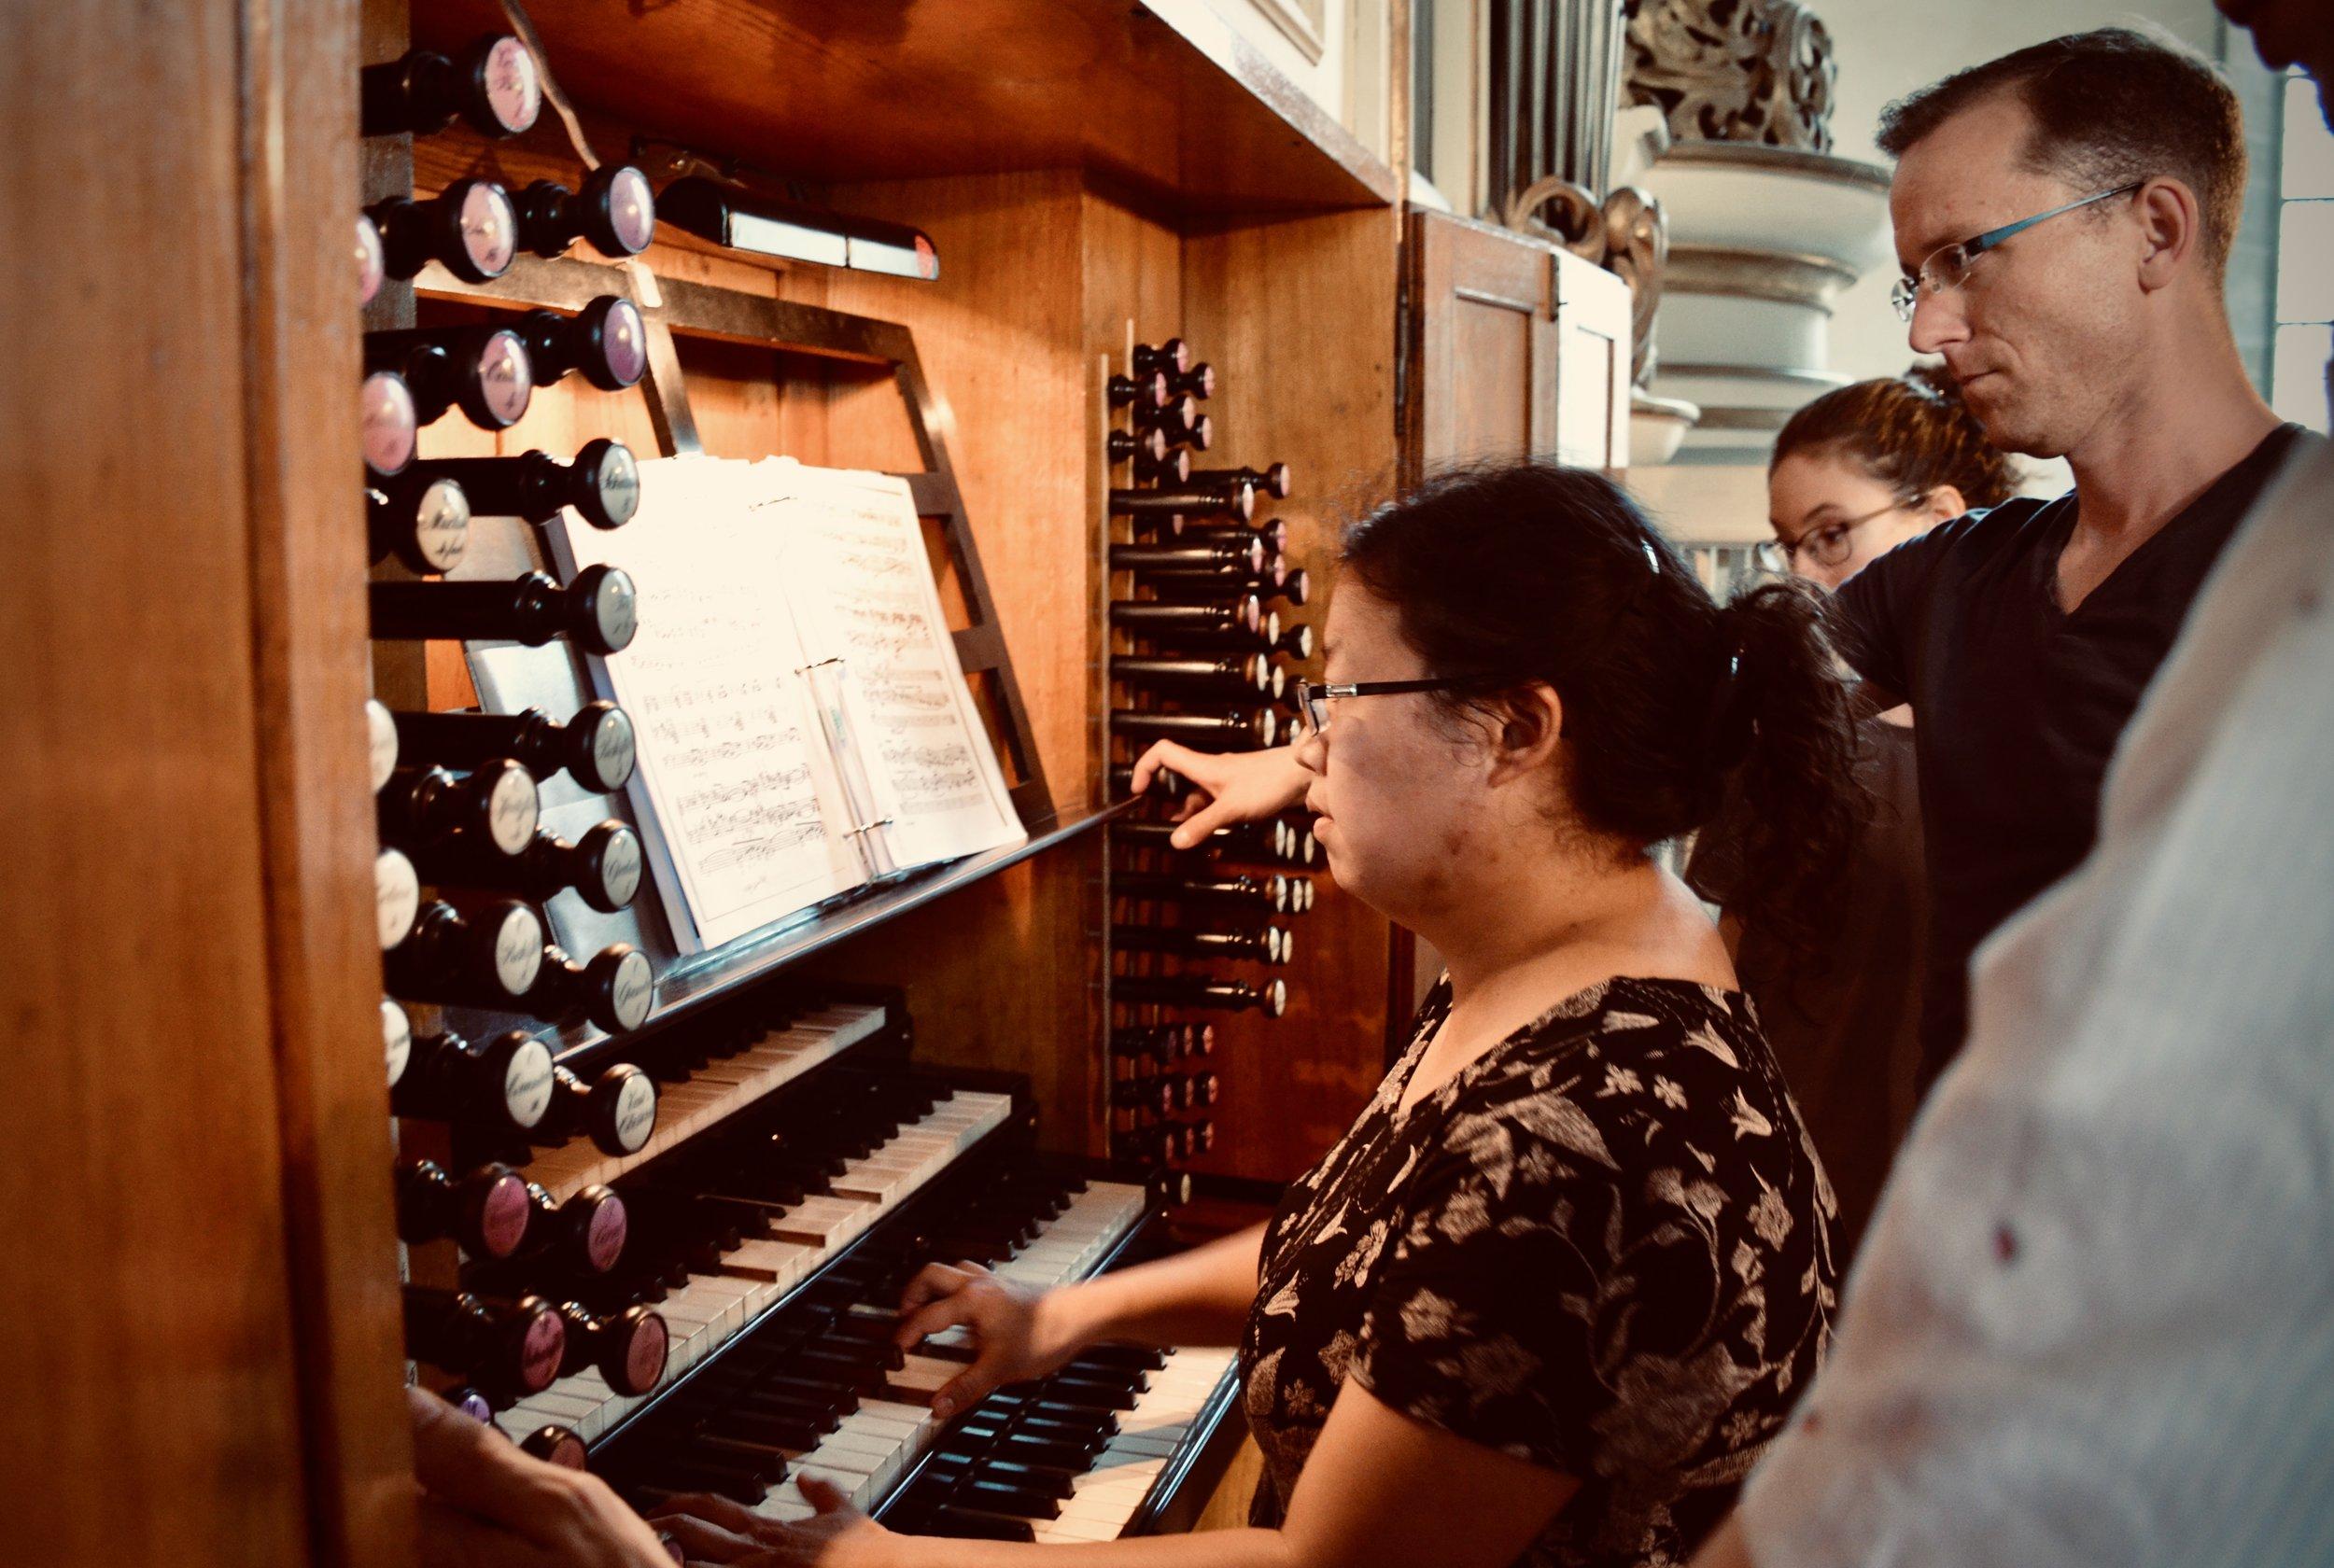 Jennifer Hsiao plays the 1855 Ladegast Organ, Merseburg Dom.